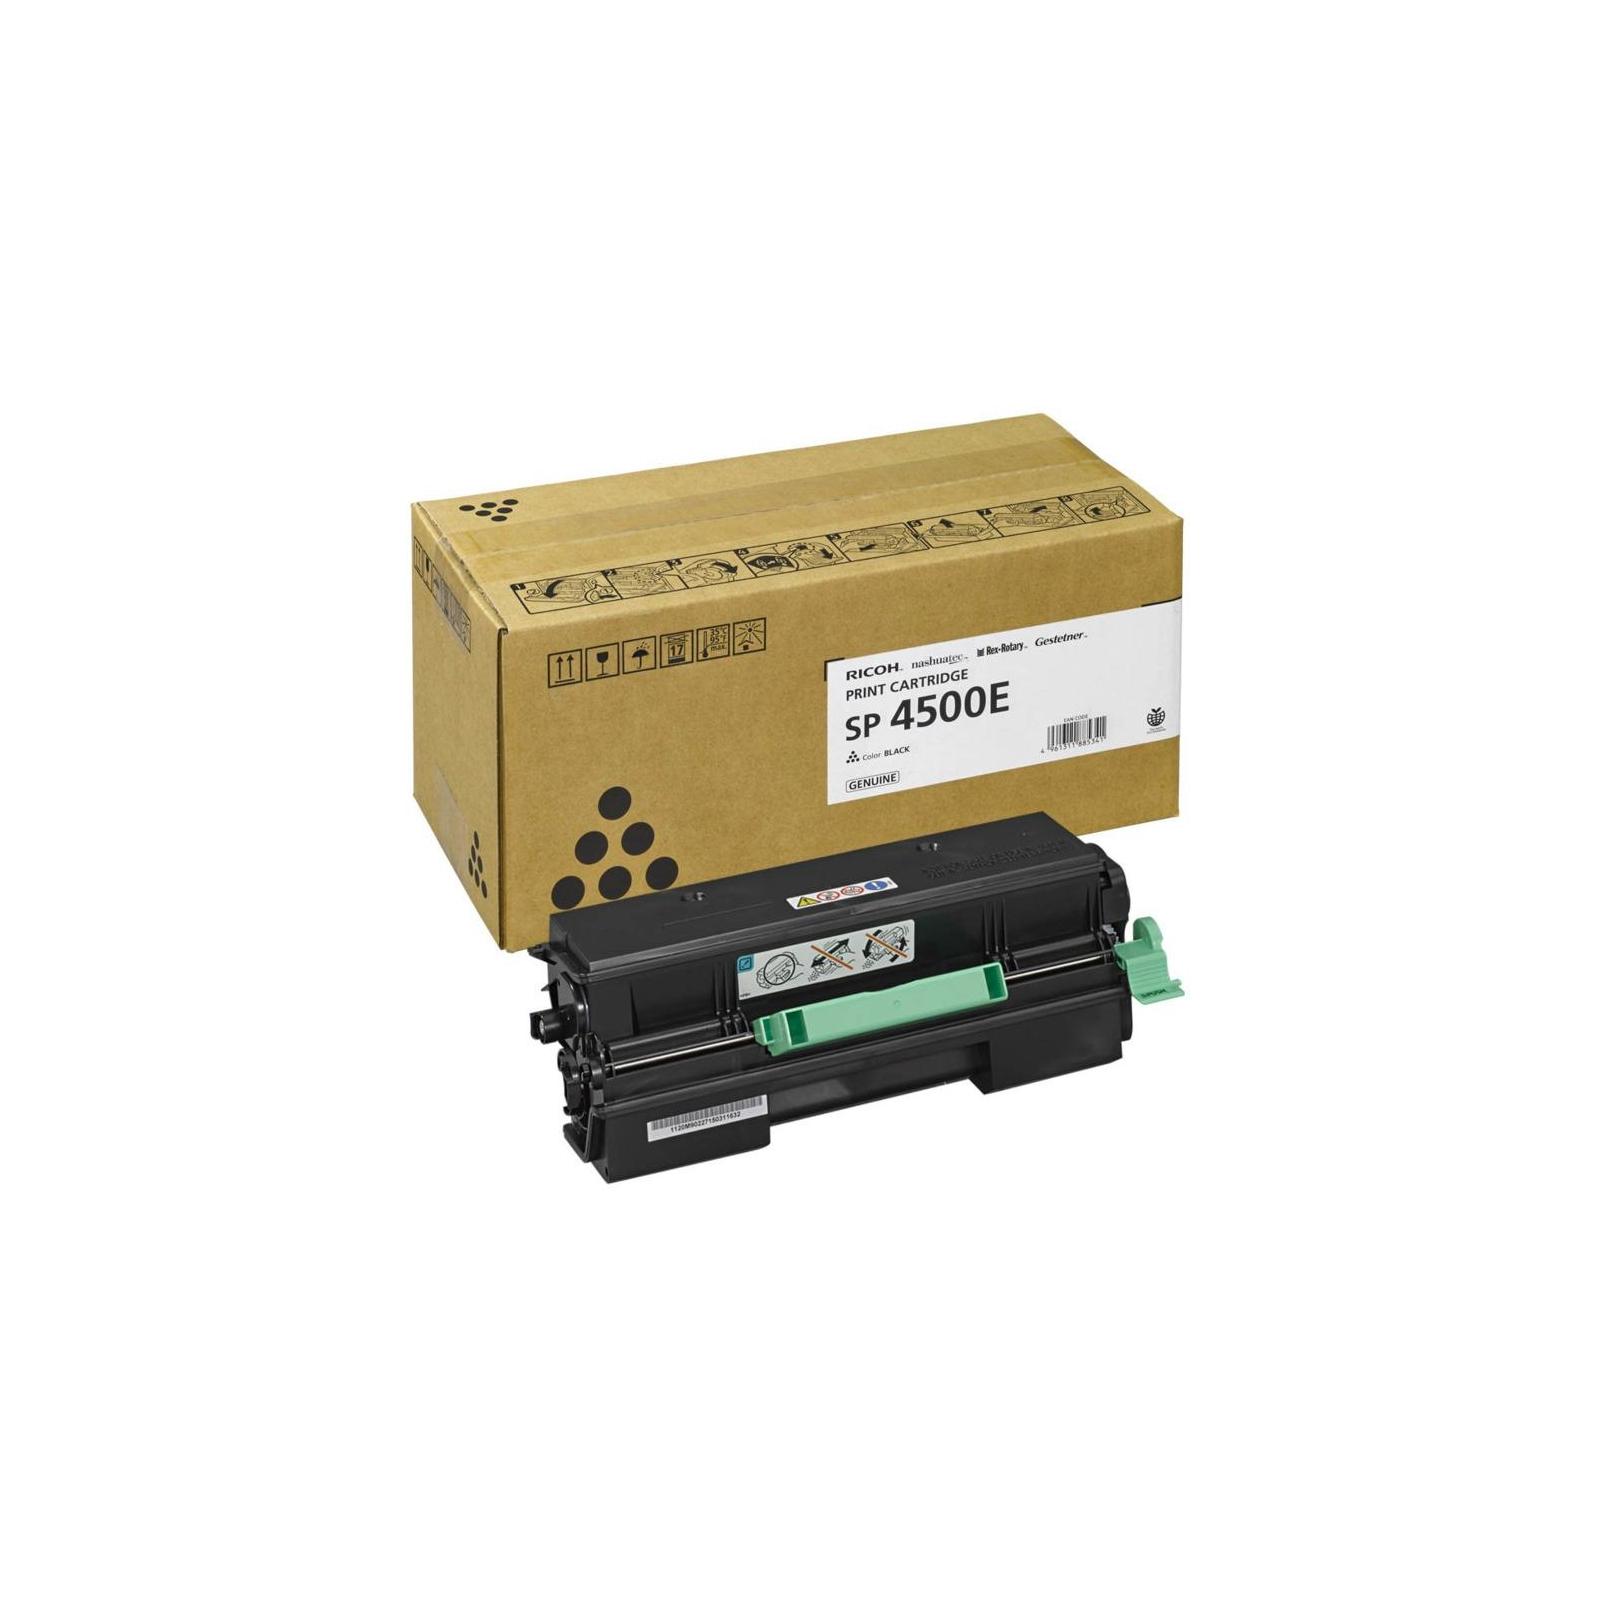 Тонер-картридж Ricoh SP4500LE Black 6К SP3600sf/SP3610sf/SP4510sf (407340)